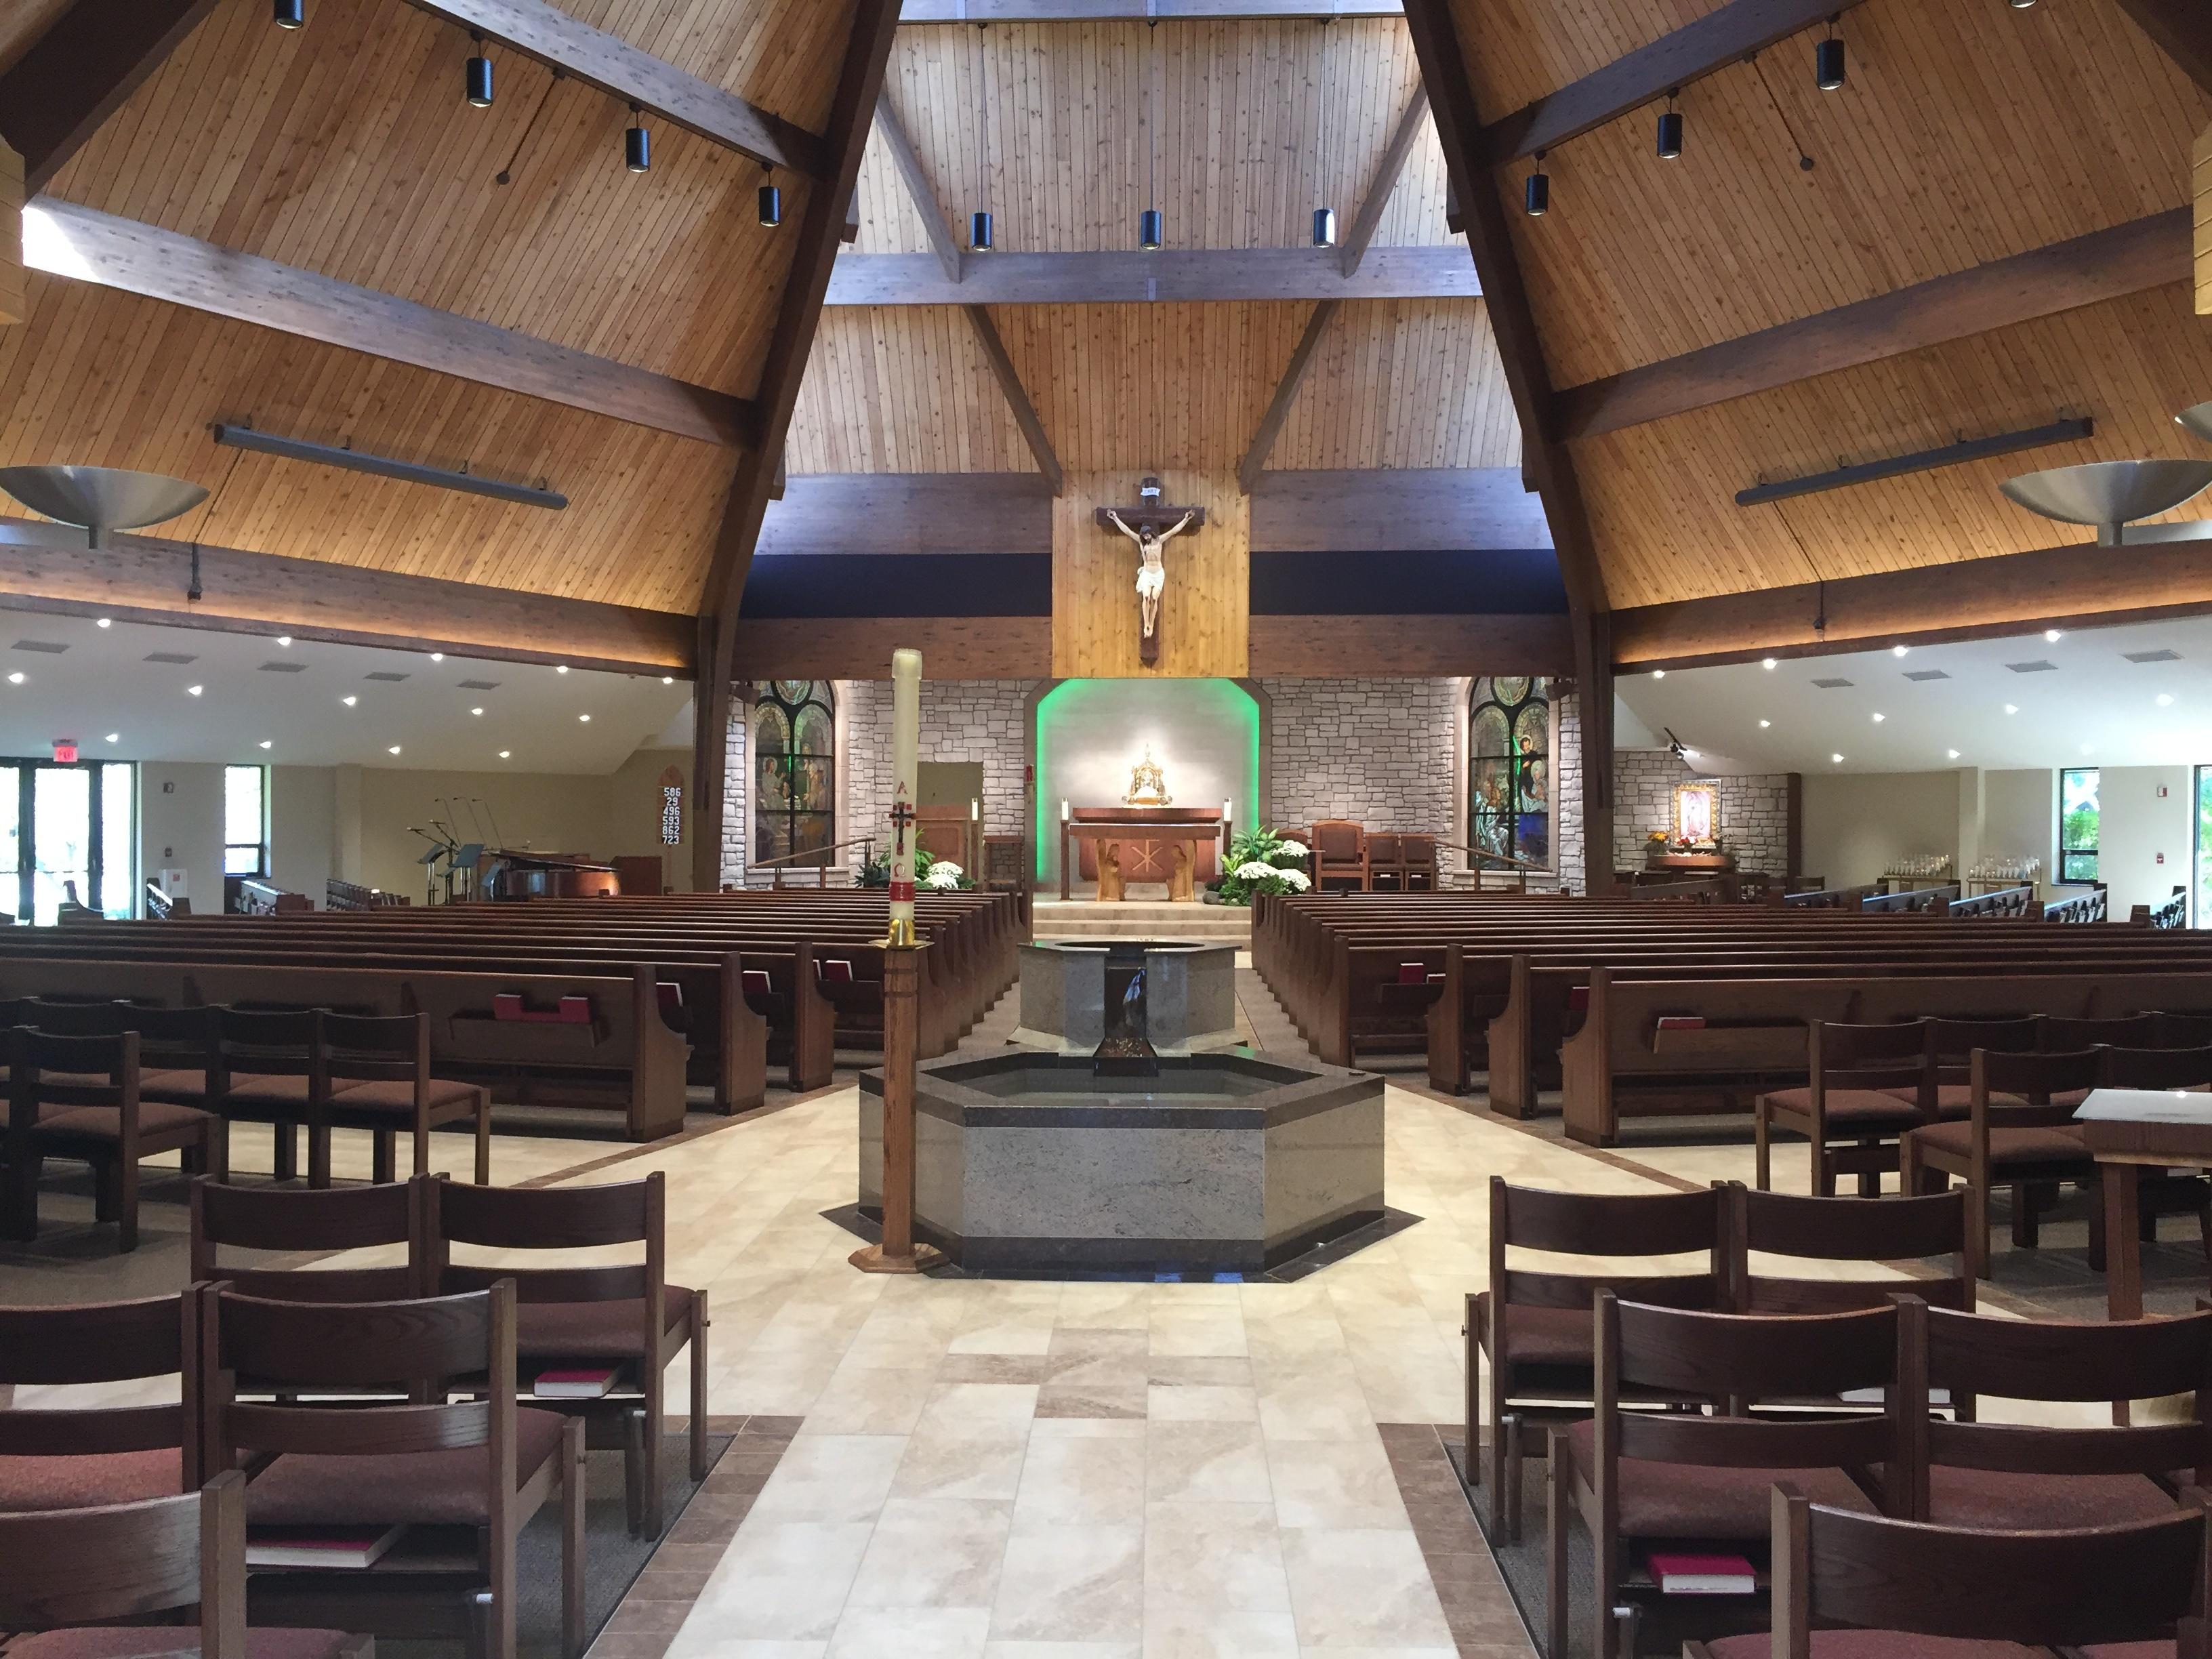 Illuminart Principal R. White Highlights Team Partnership in Successful Church Lighting Design Renovation